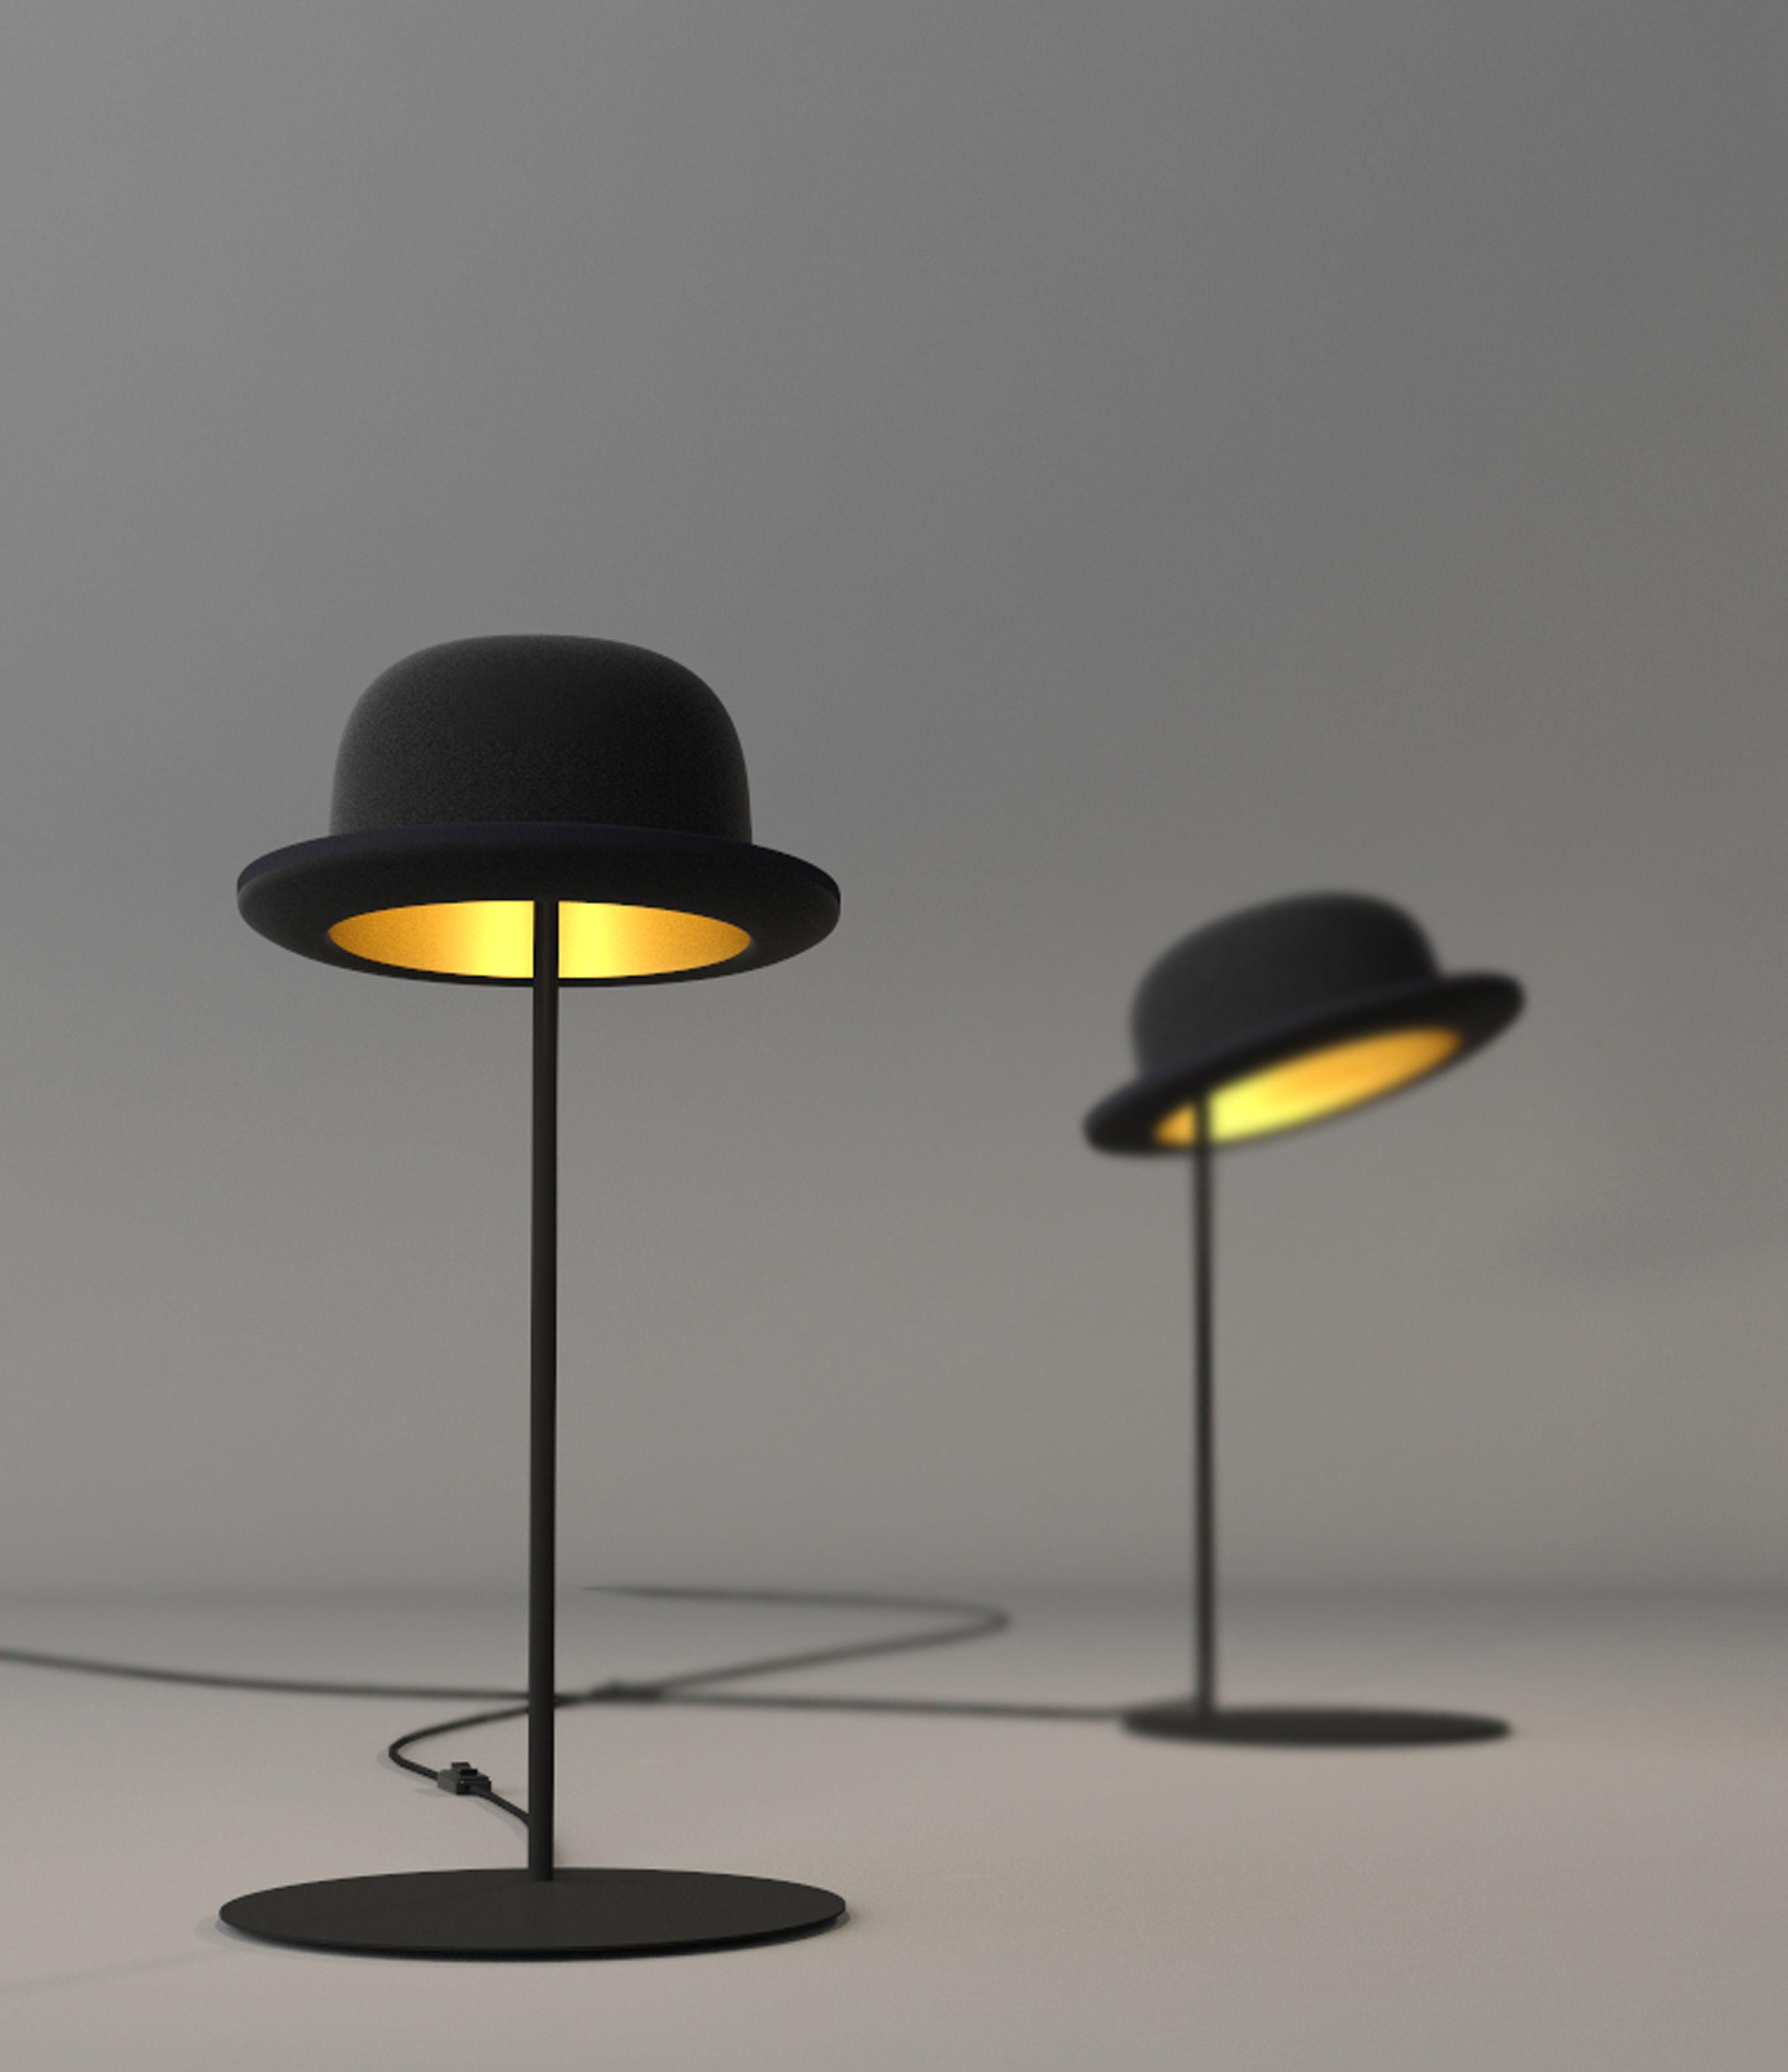 cf0eaa468fd1ce4a437afdfd5602d3bc Résultat Supérieur 60 Luxe Lampe Decorative Stock 2018 Ldkt